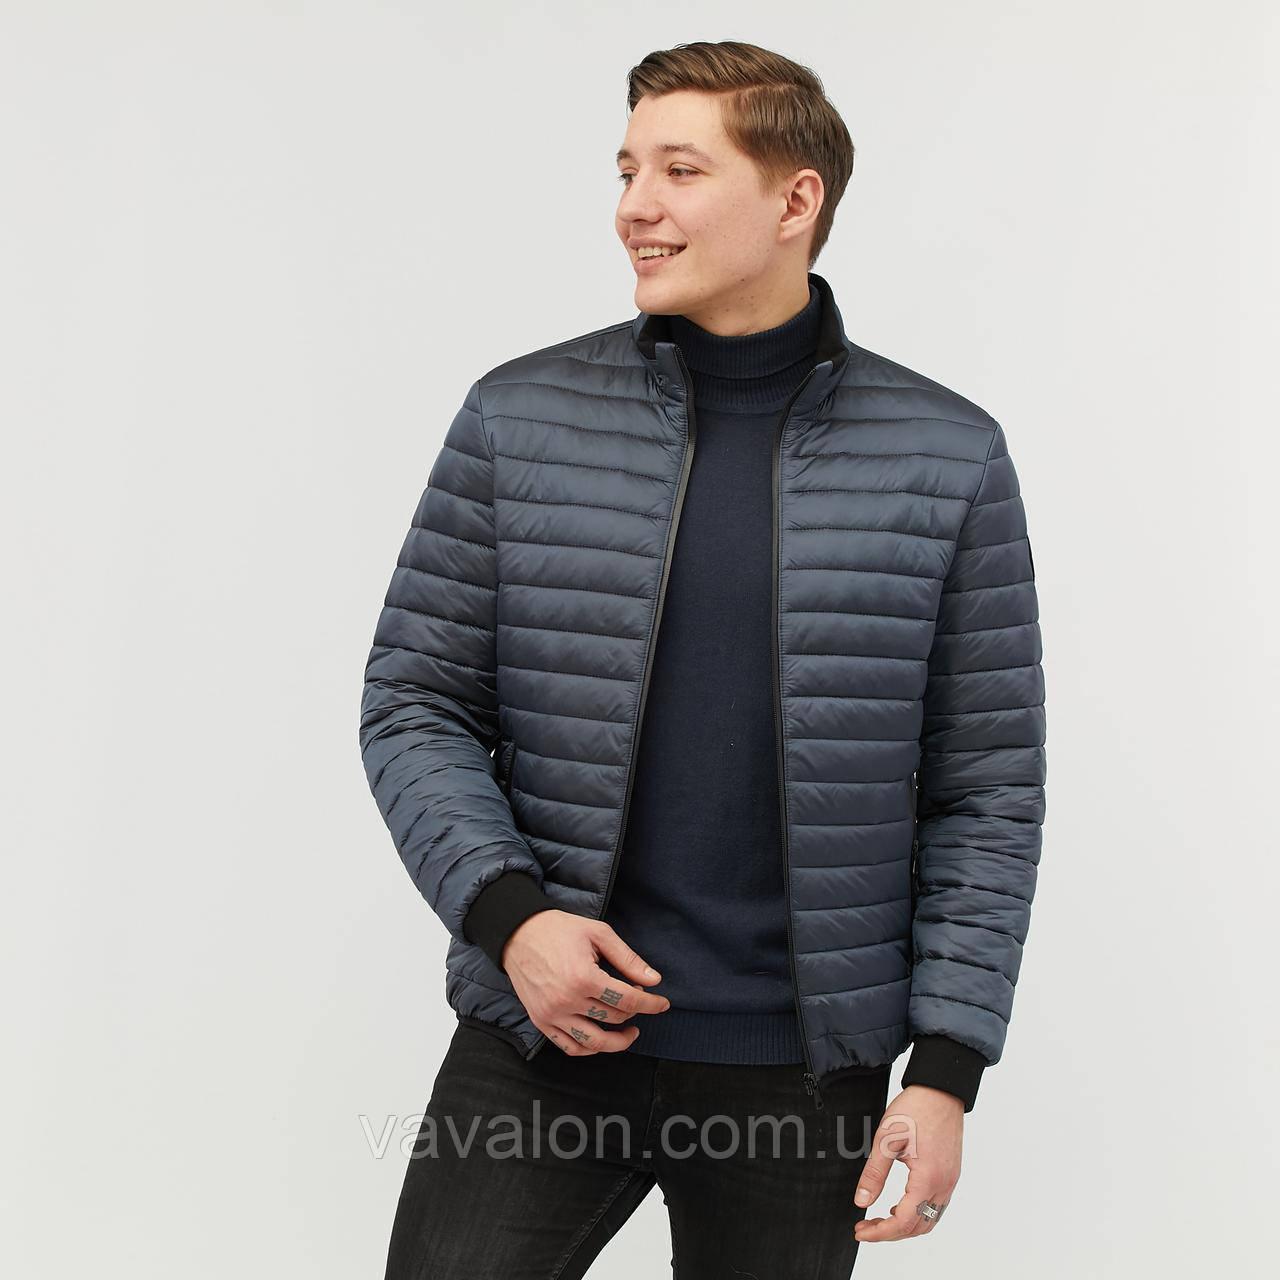 Куртка демисезонная Vavalon KD-191 gray